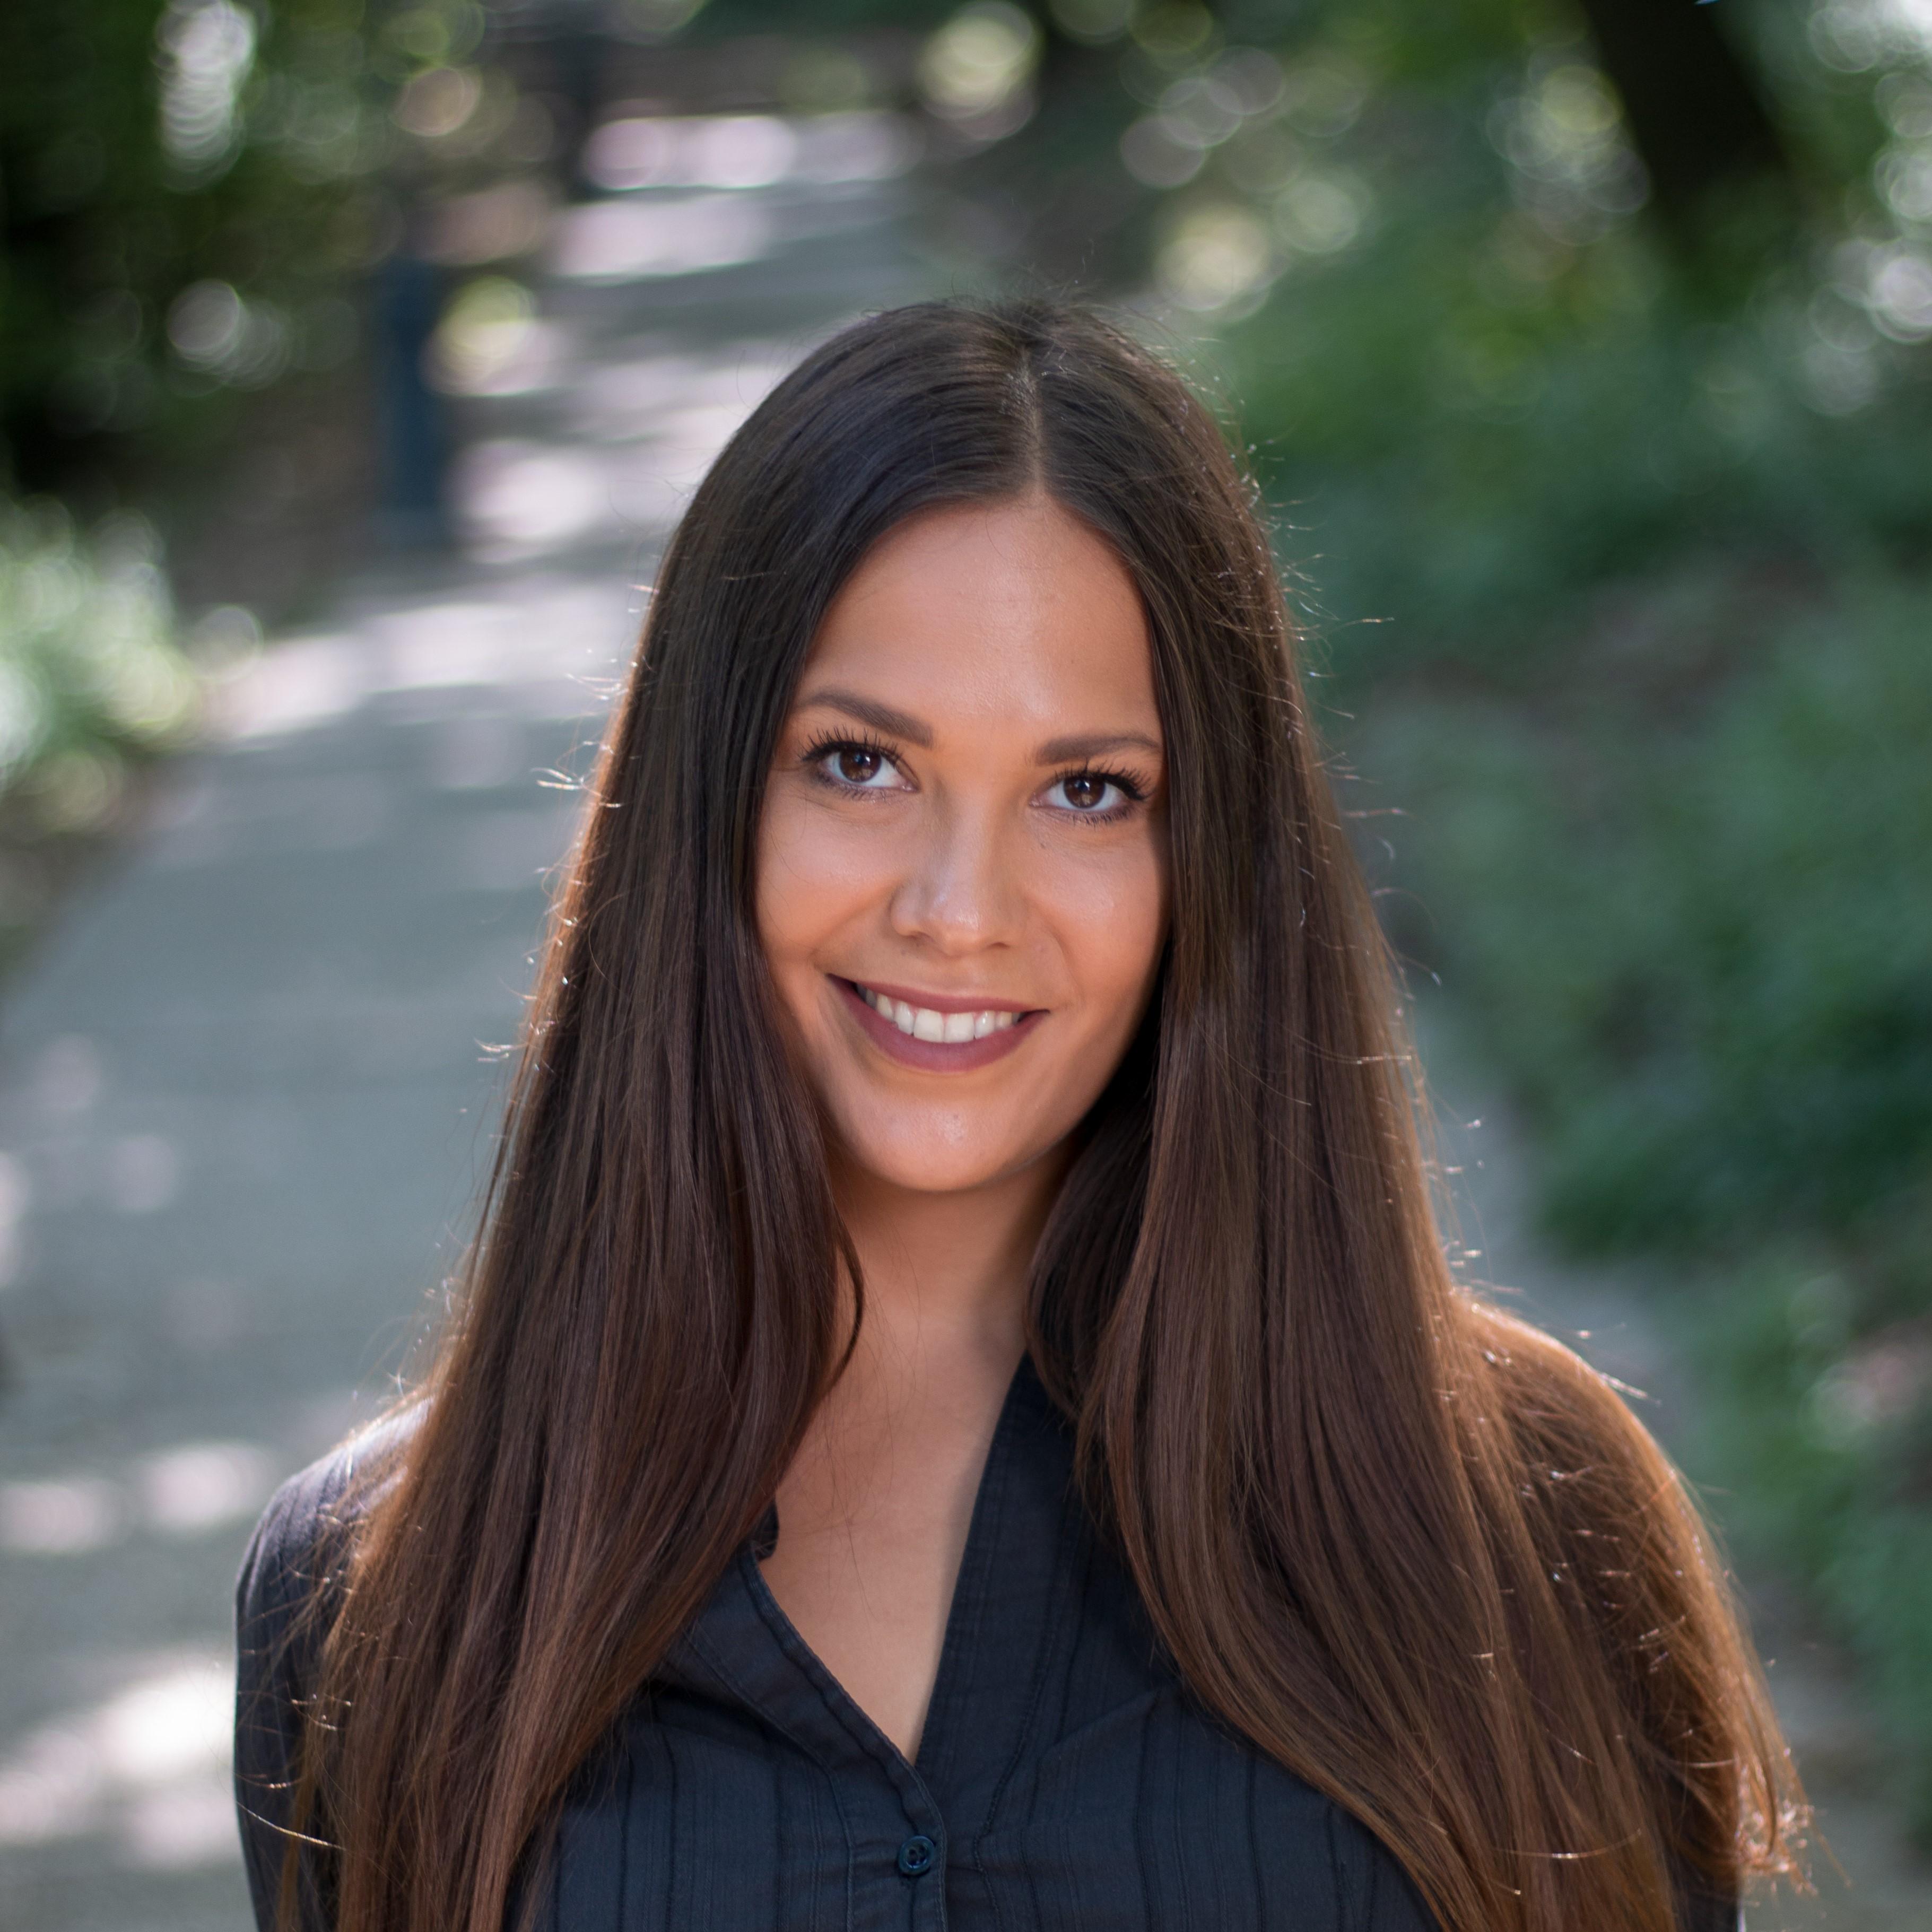 Anna Bauer Marketing Manager at DiabTrend